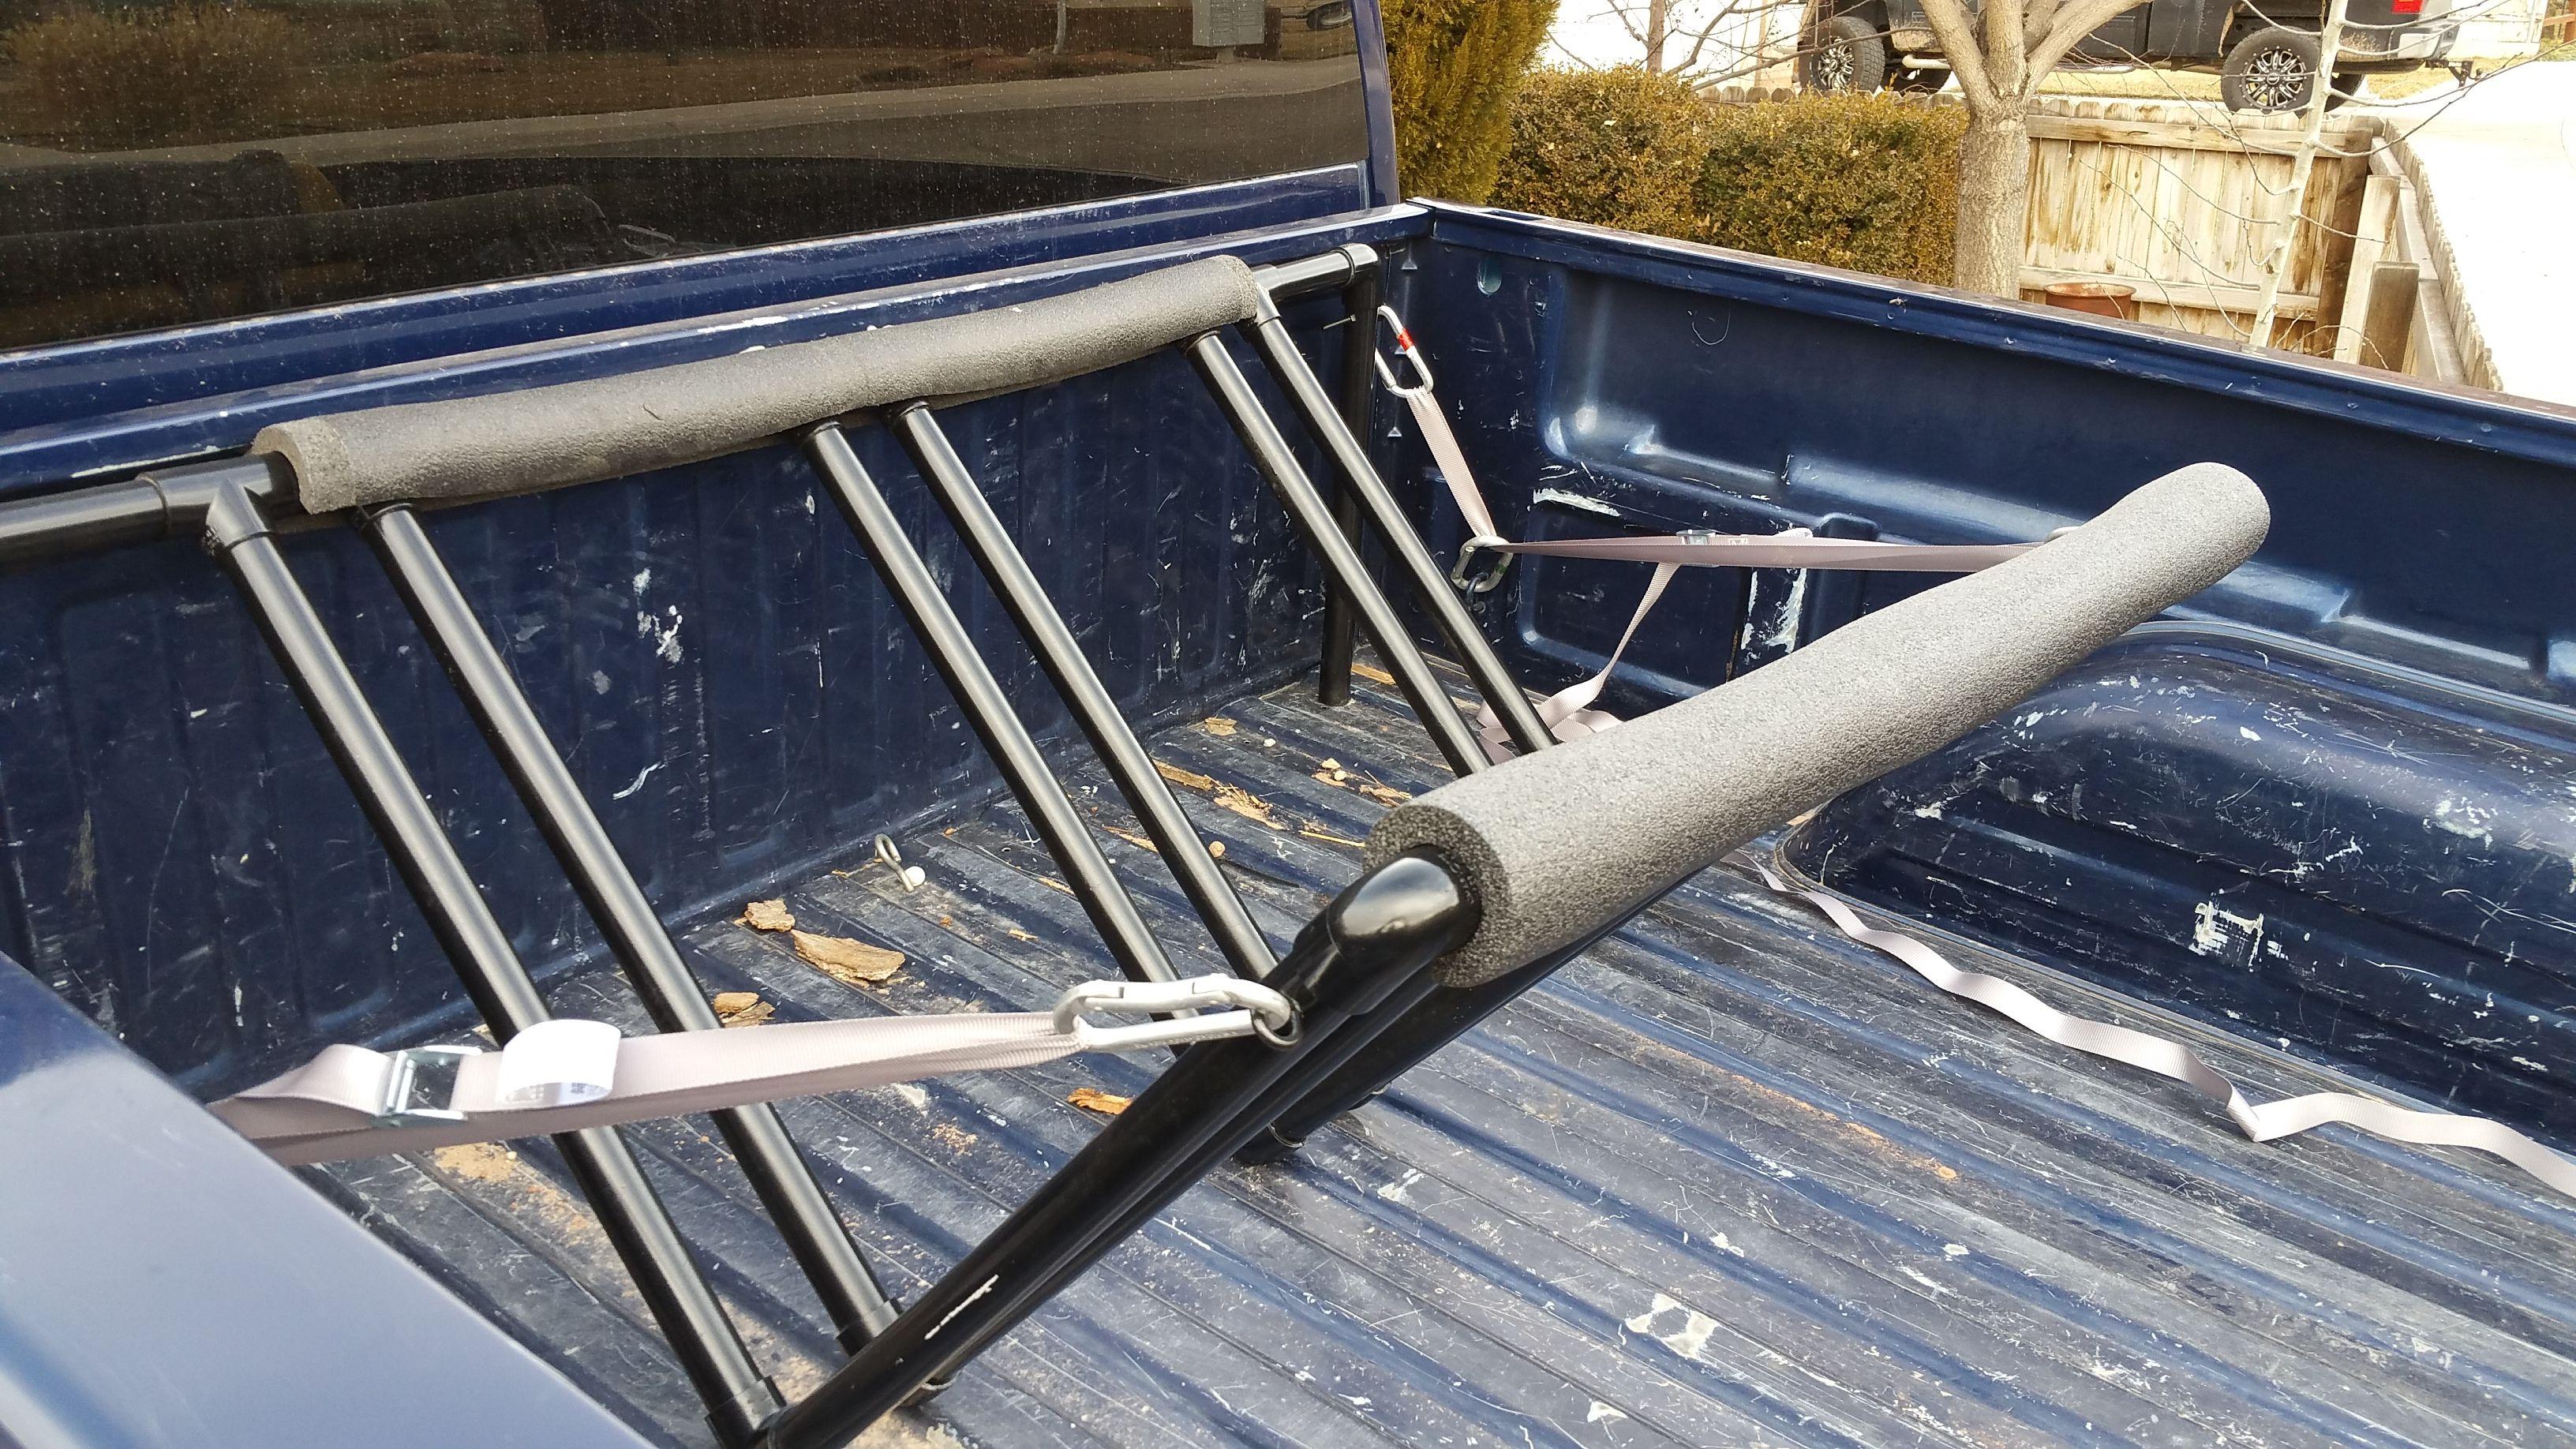 DIY Truck bed PVC bike rack.